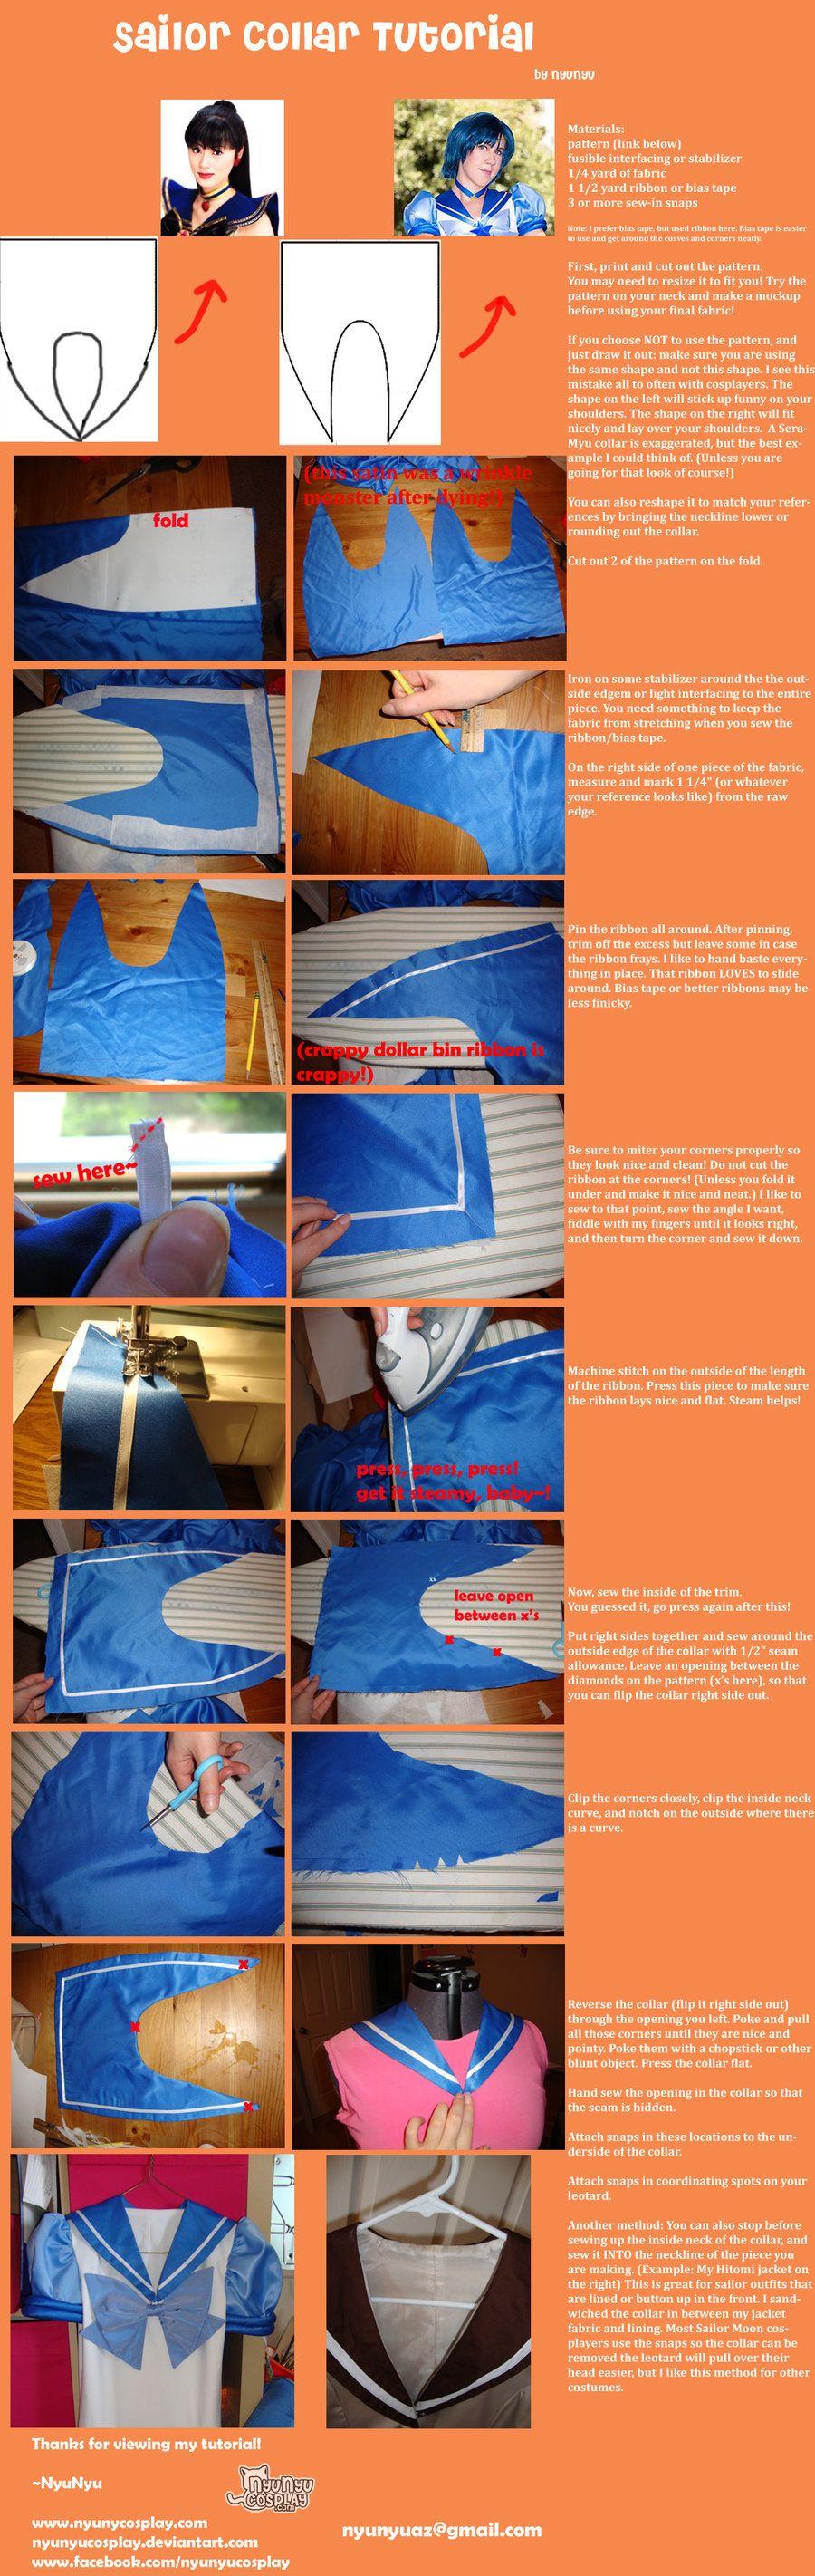 sailor collar tutorial by on. Black Bedroom Furniture Sets. Home Design Ideas